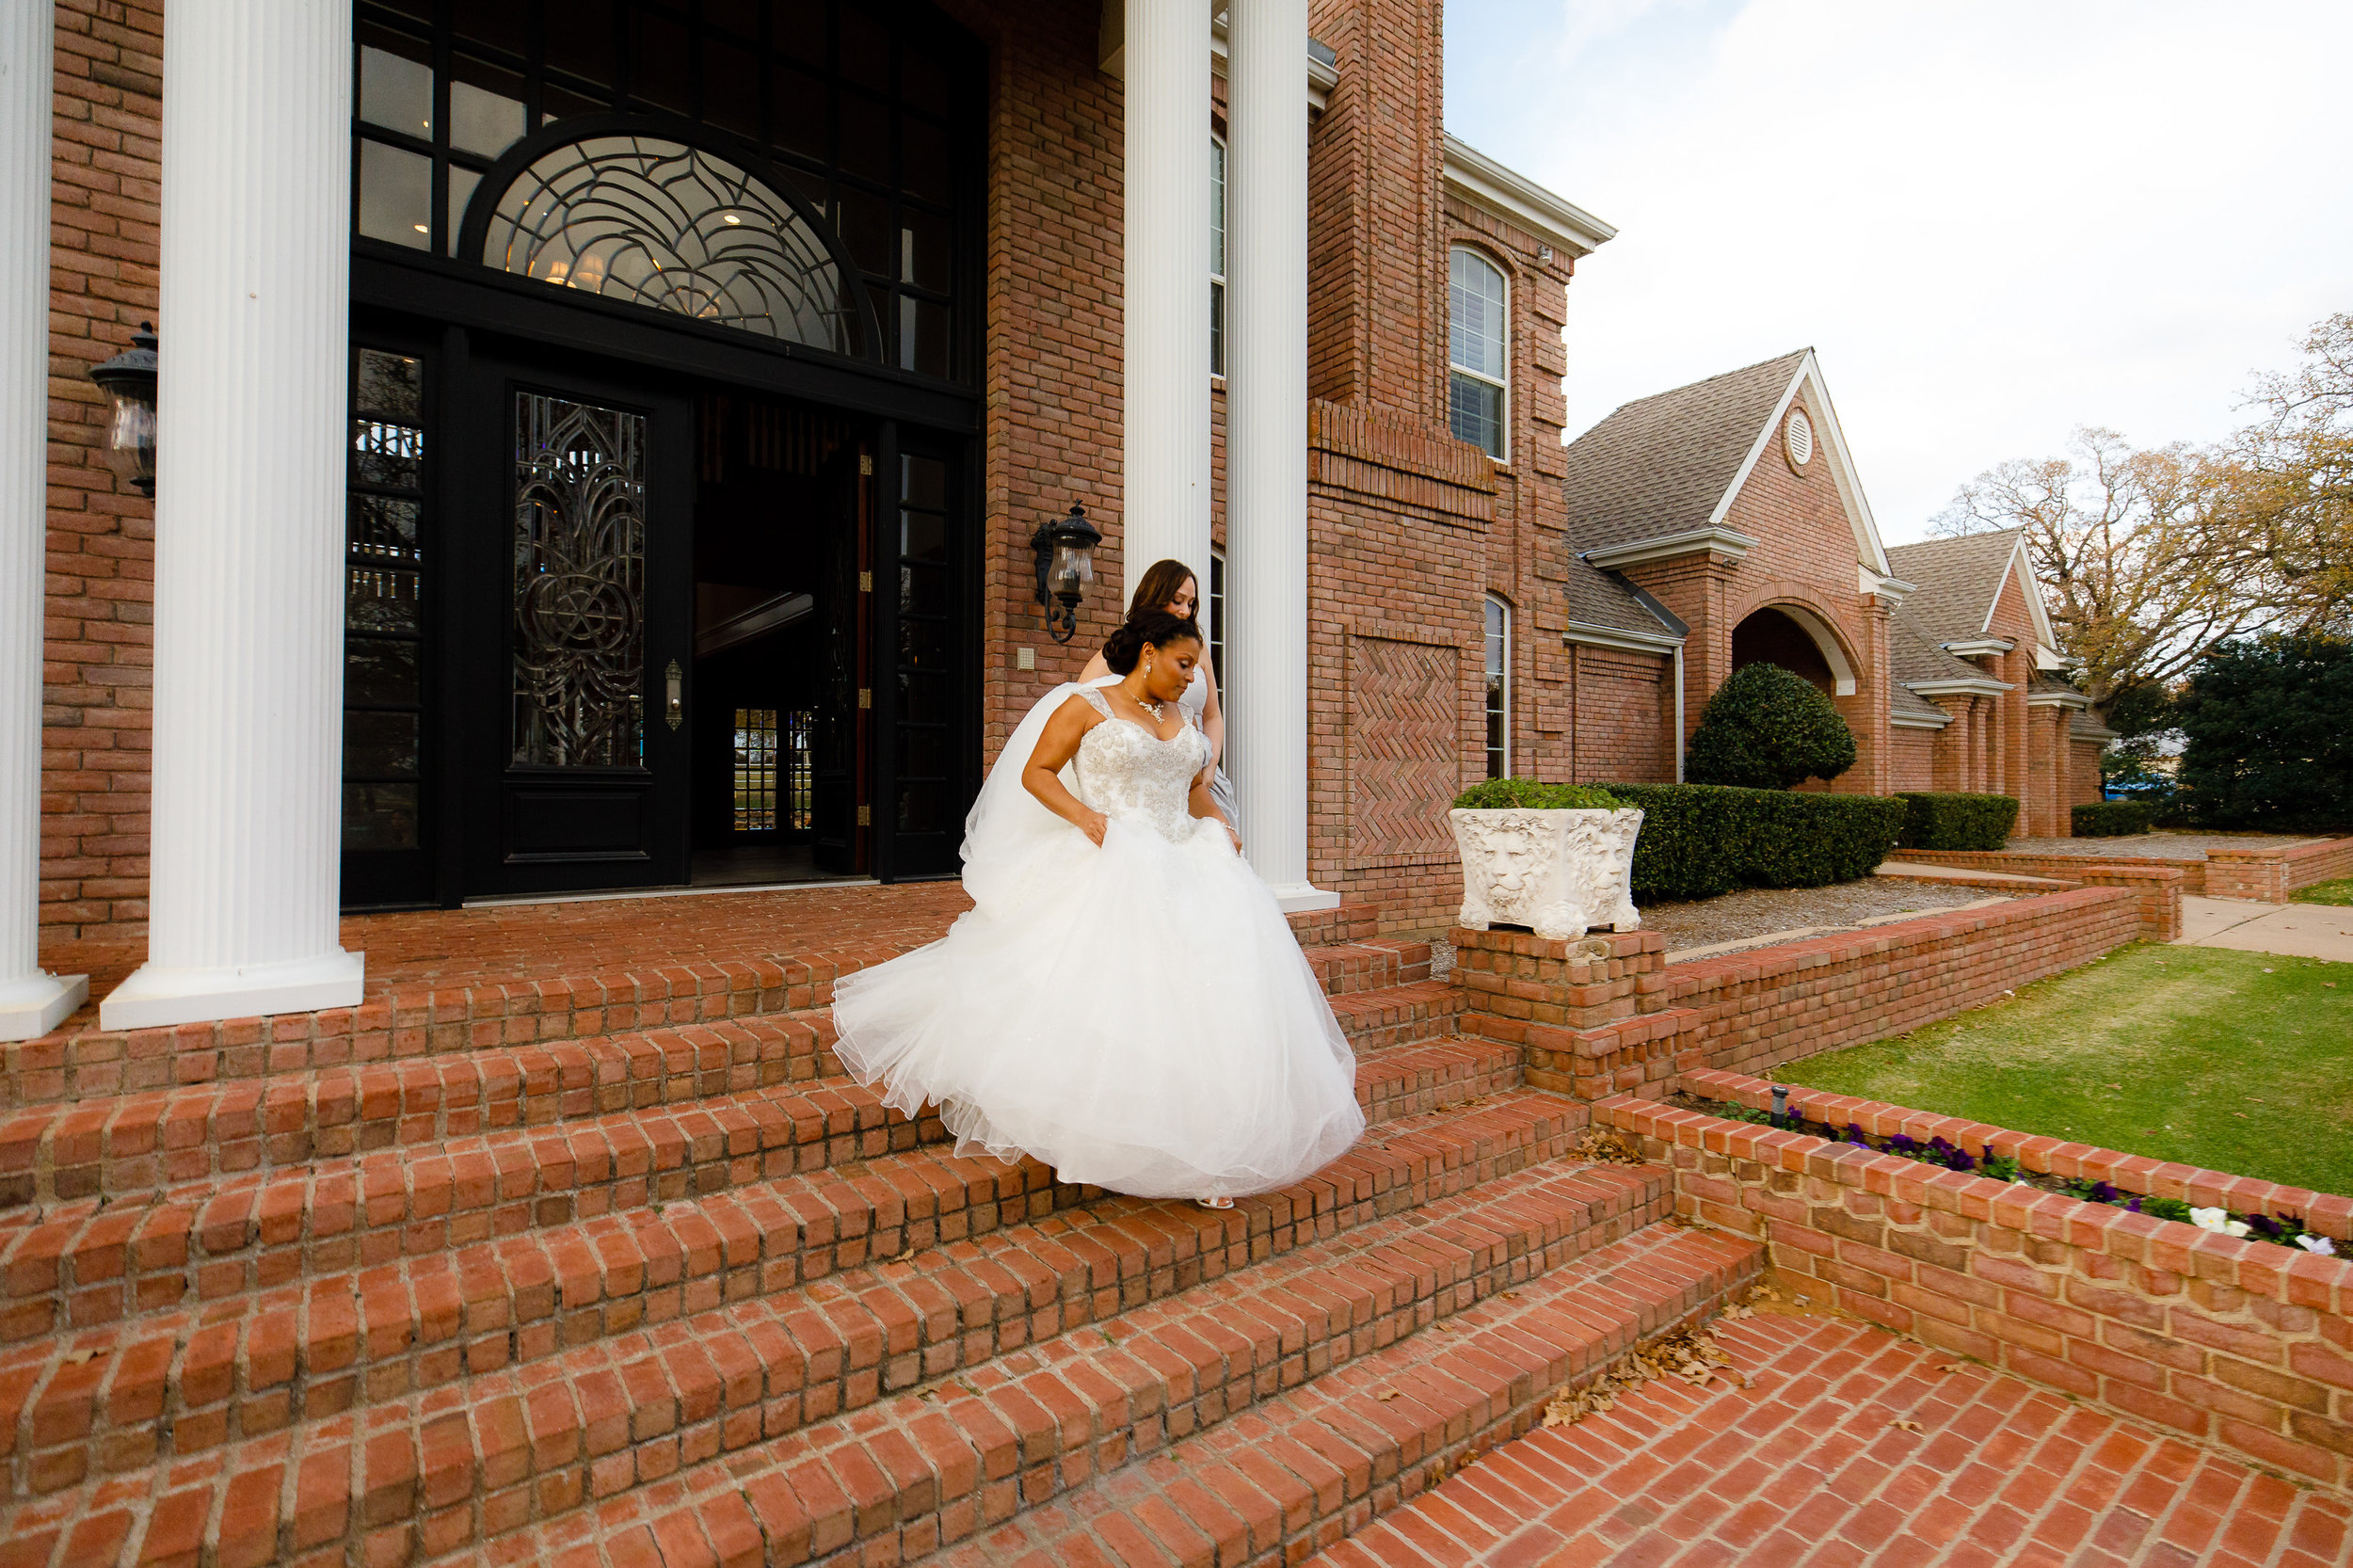 Dallas-wedding-planner-swank-soiree-fort-worth-weddingTLWed1217-228.jpg